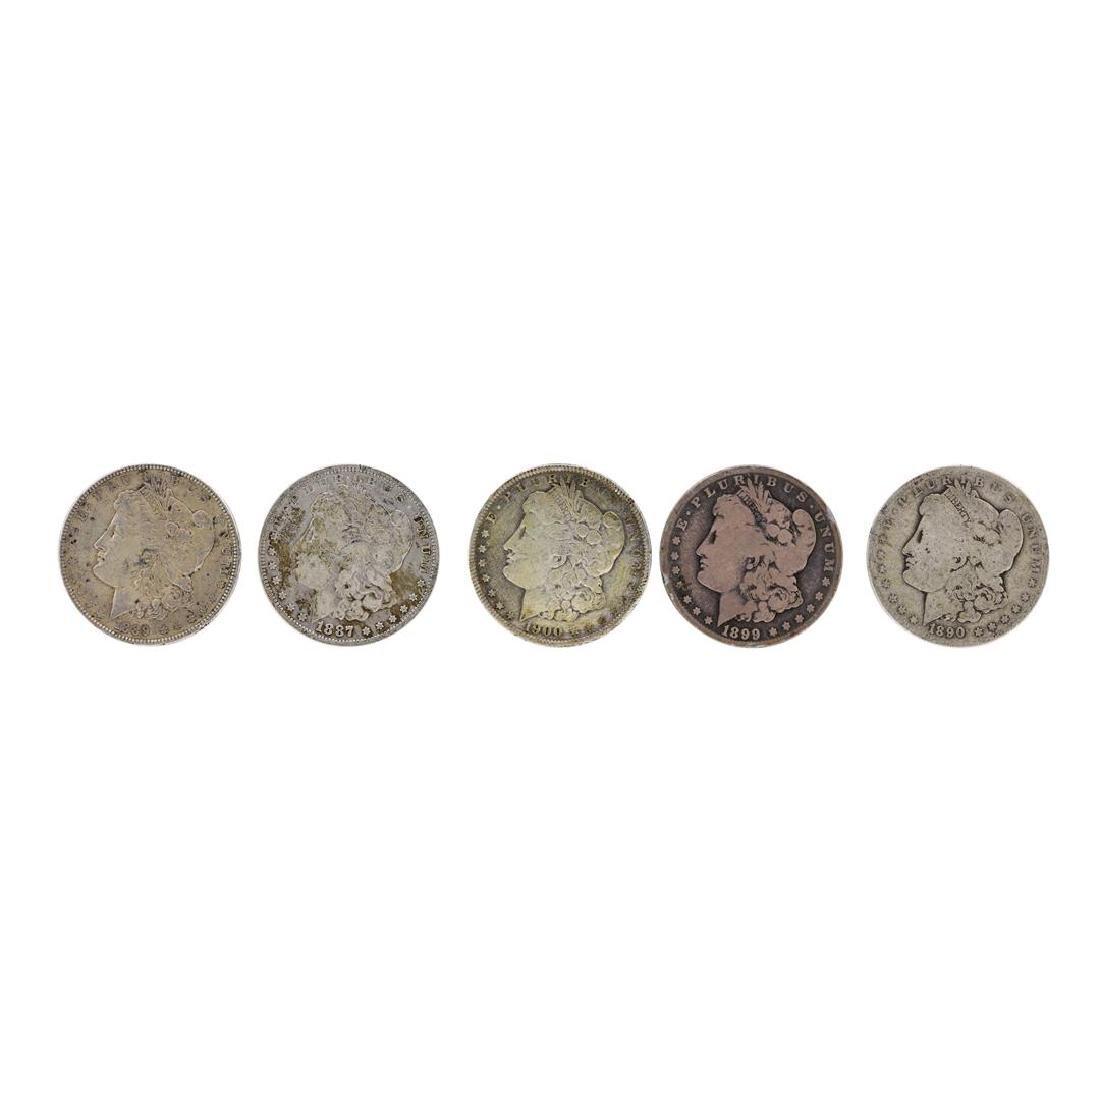 Lot of (5) Pre 1921 $1 Morgan Silver Dollar Coins